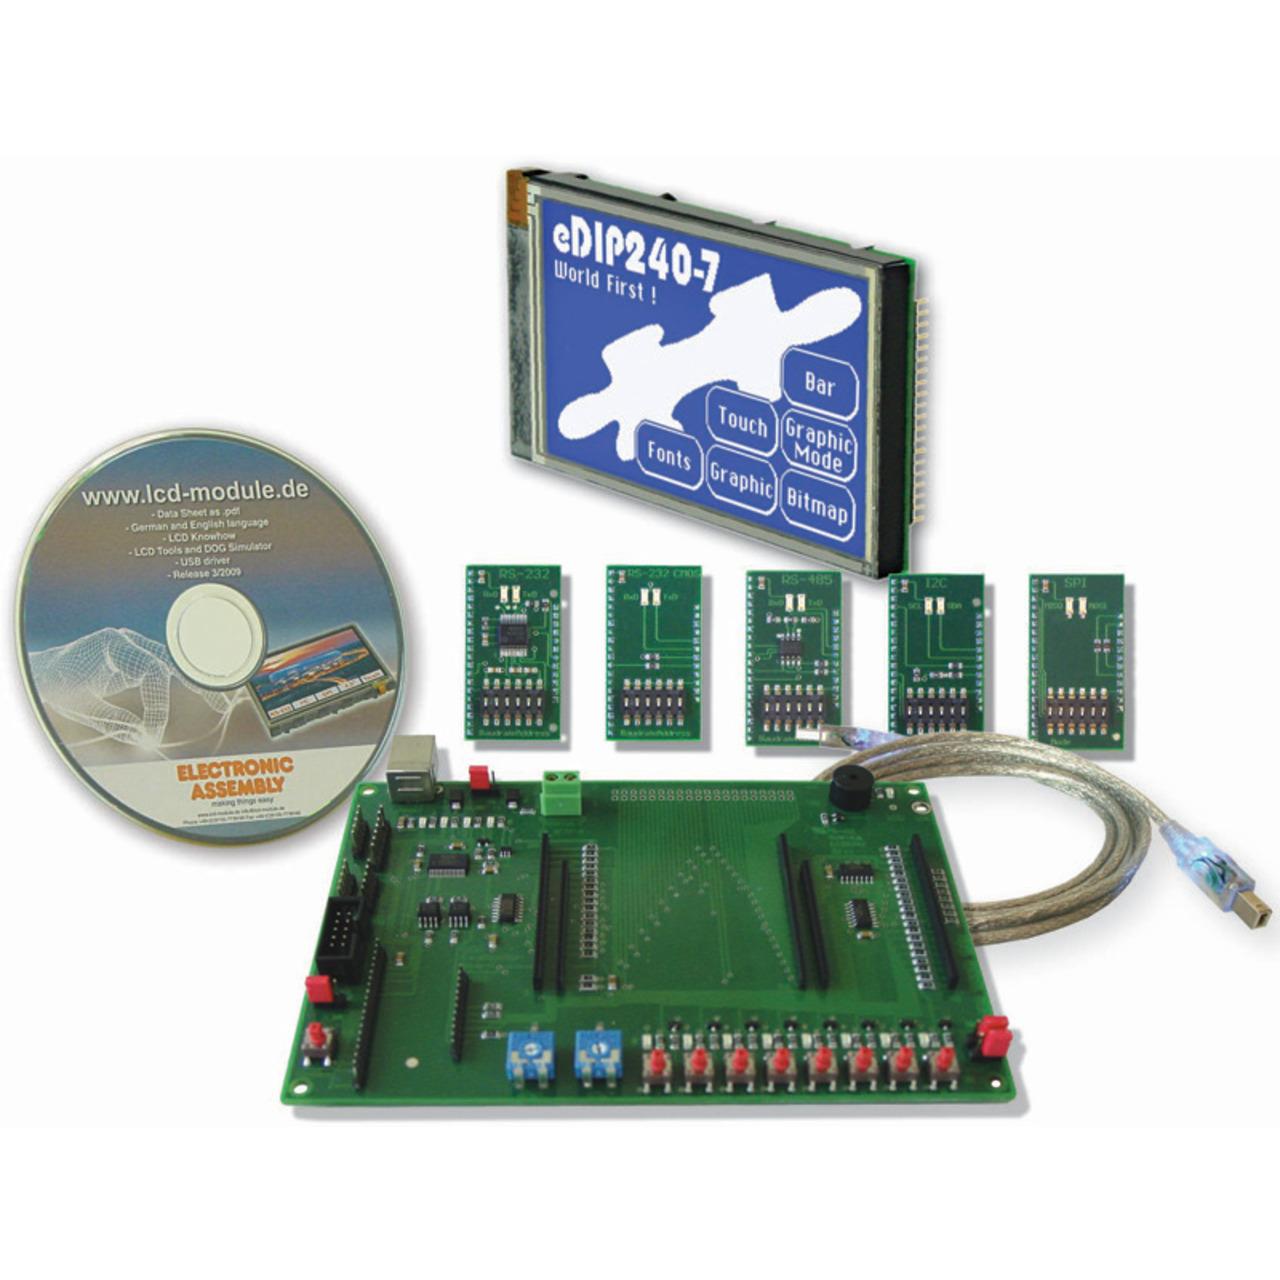 Electronic Assembly Starterkit mit Grafik-LCD EA EVALeDIP240B 240x128 Pixel